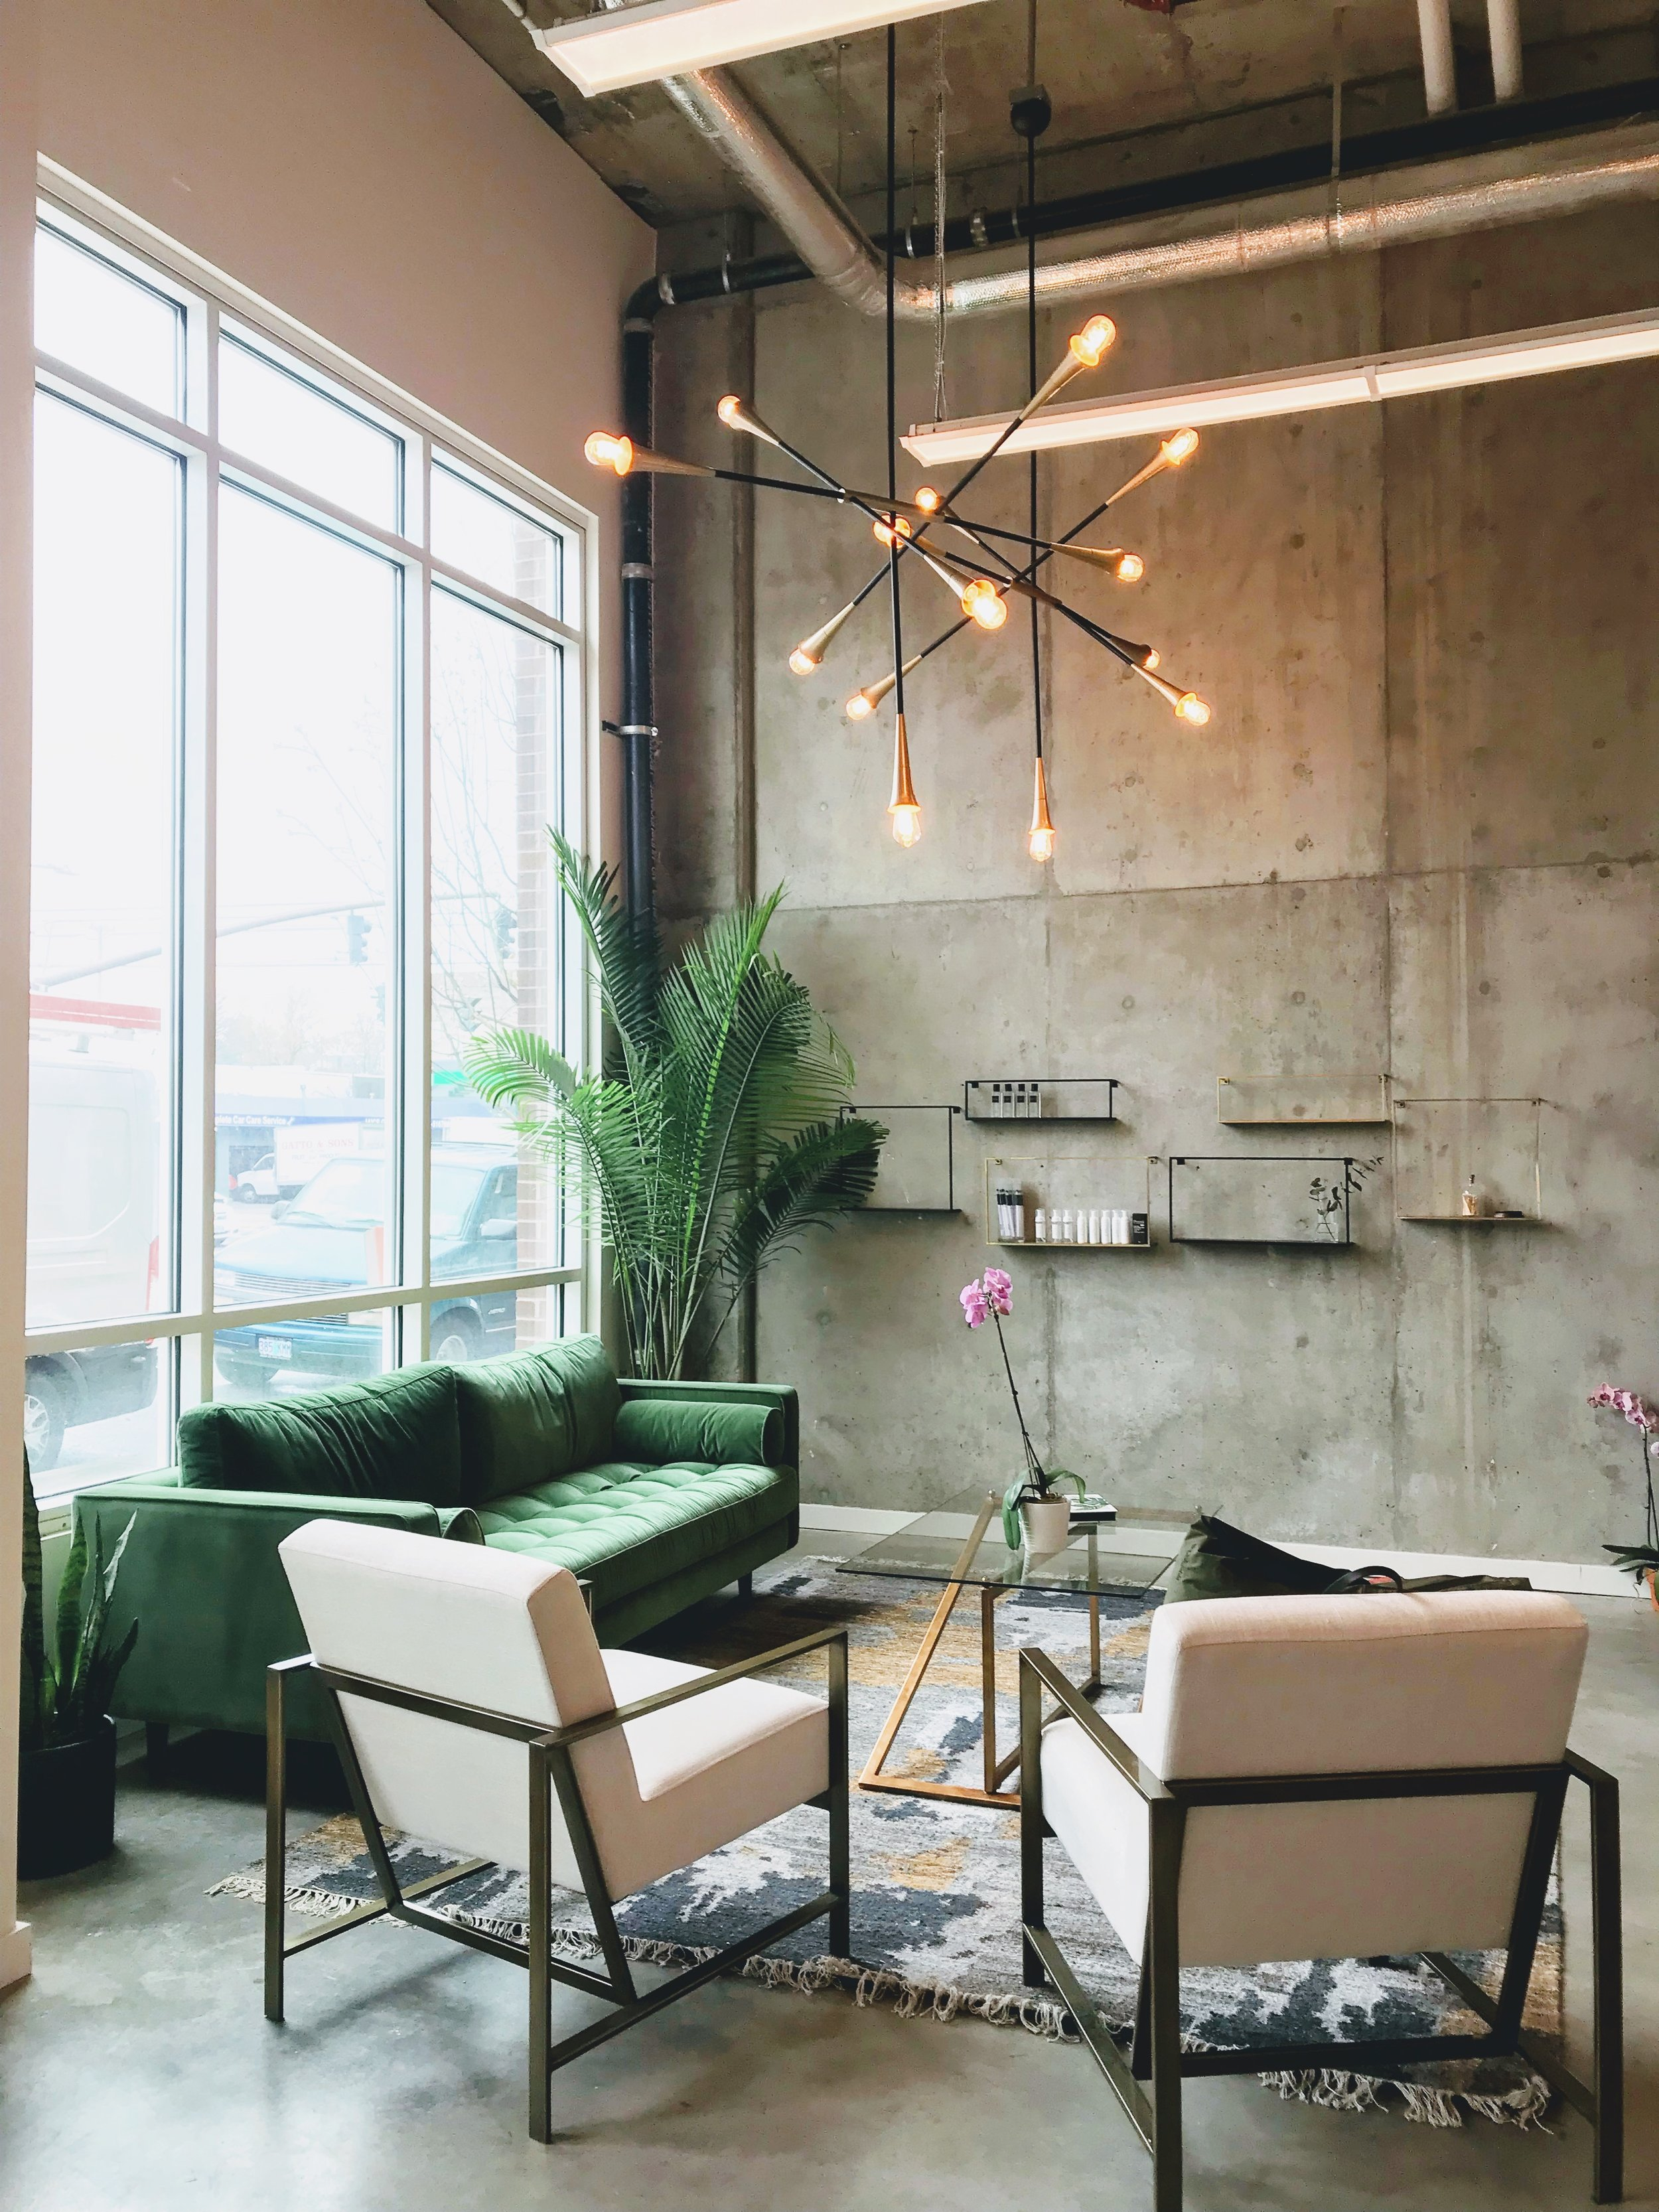 Commercial Installation / Revive Lash Co., Portland, Ore.